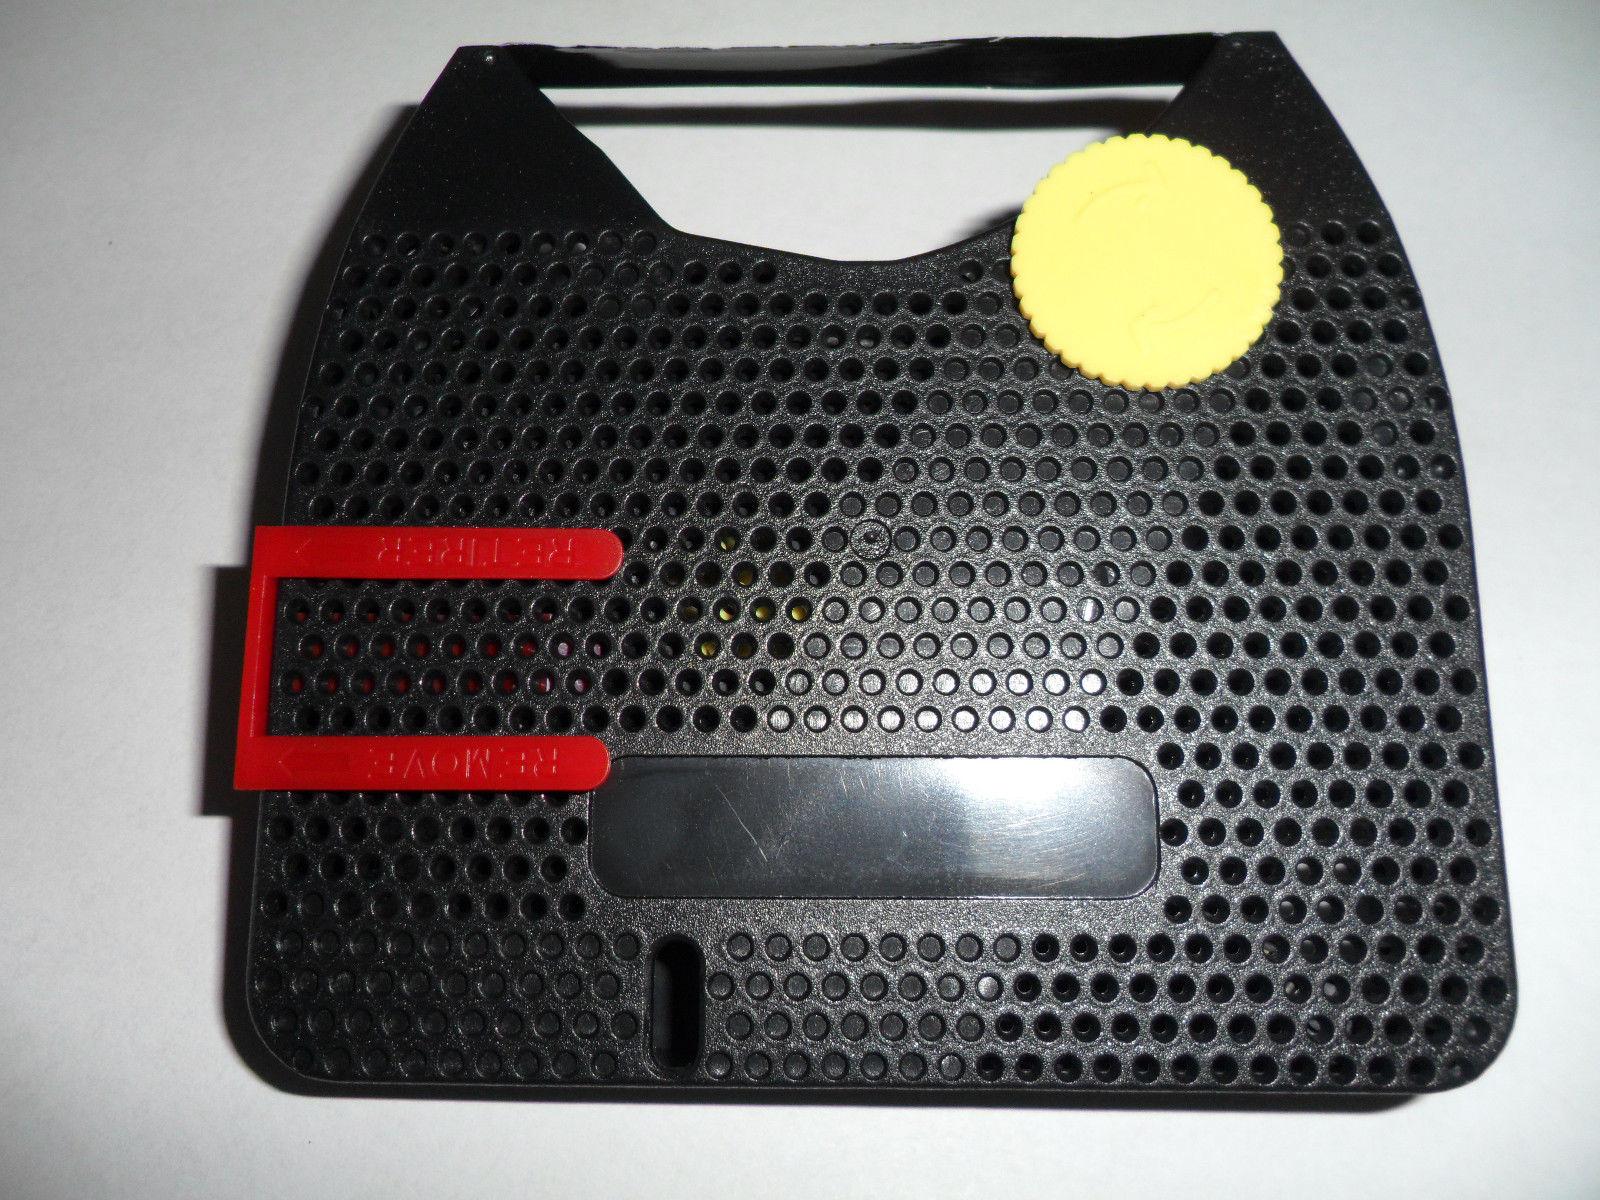 Smith Corona Mark XI Mark XII Mark XV Typewriter Ribbon (2 Pack) Replaces 21000